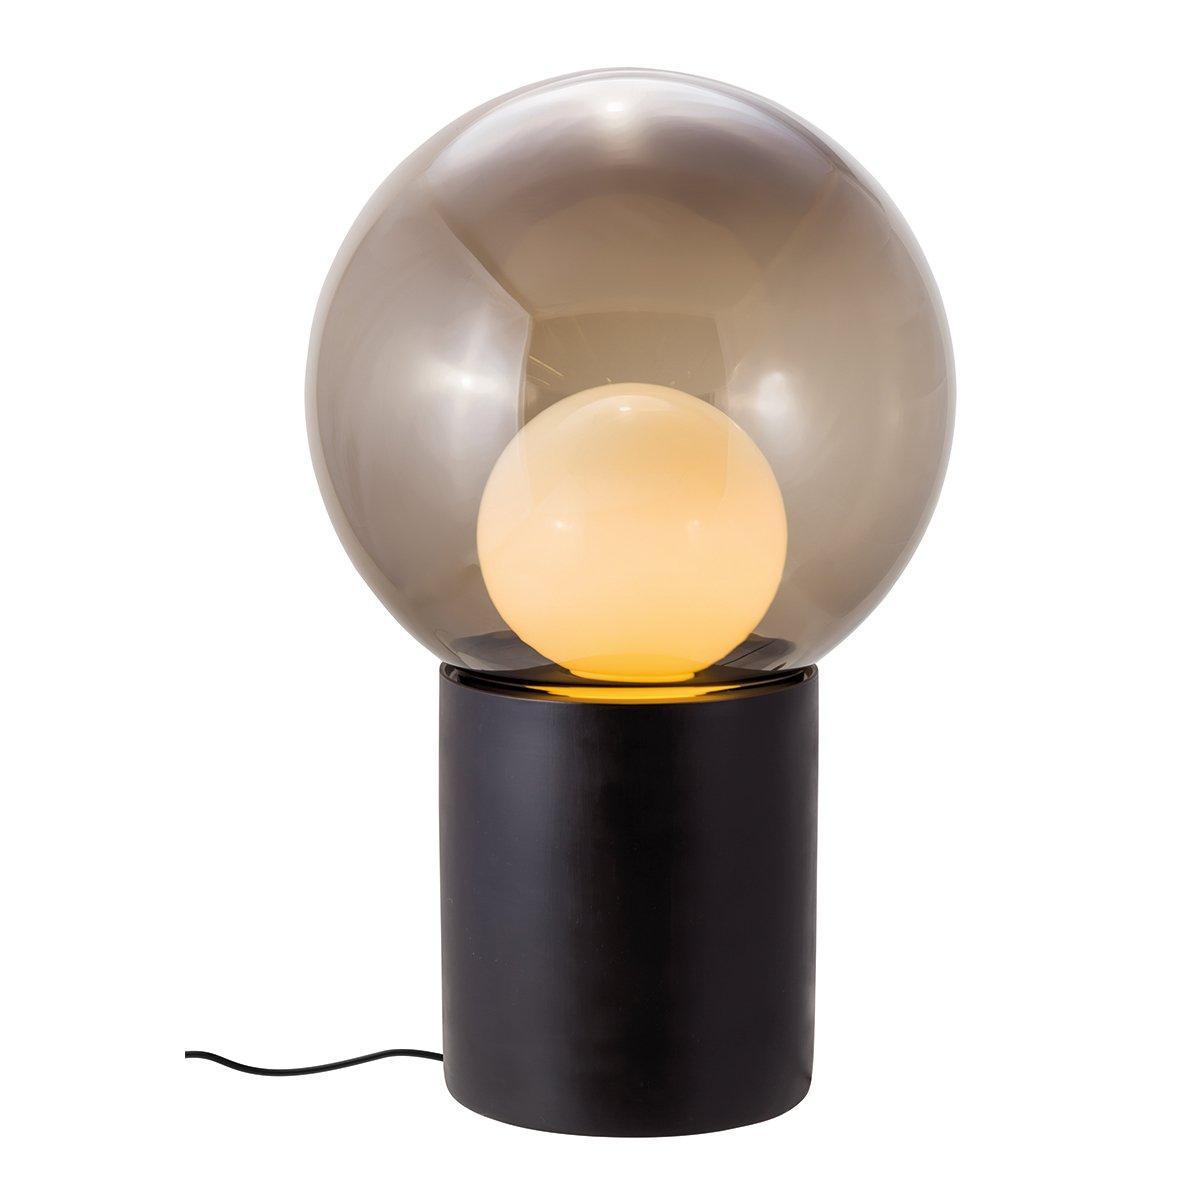 Pulpo Boule High Vloerlamp - Zwart / Smoke Grey / Opaal Wit